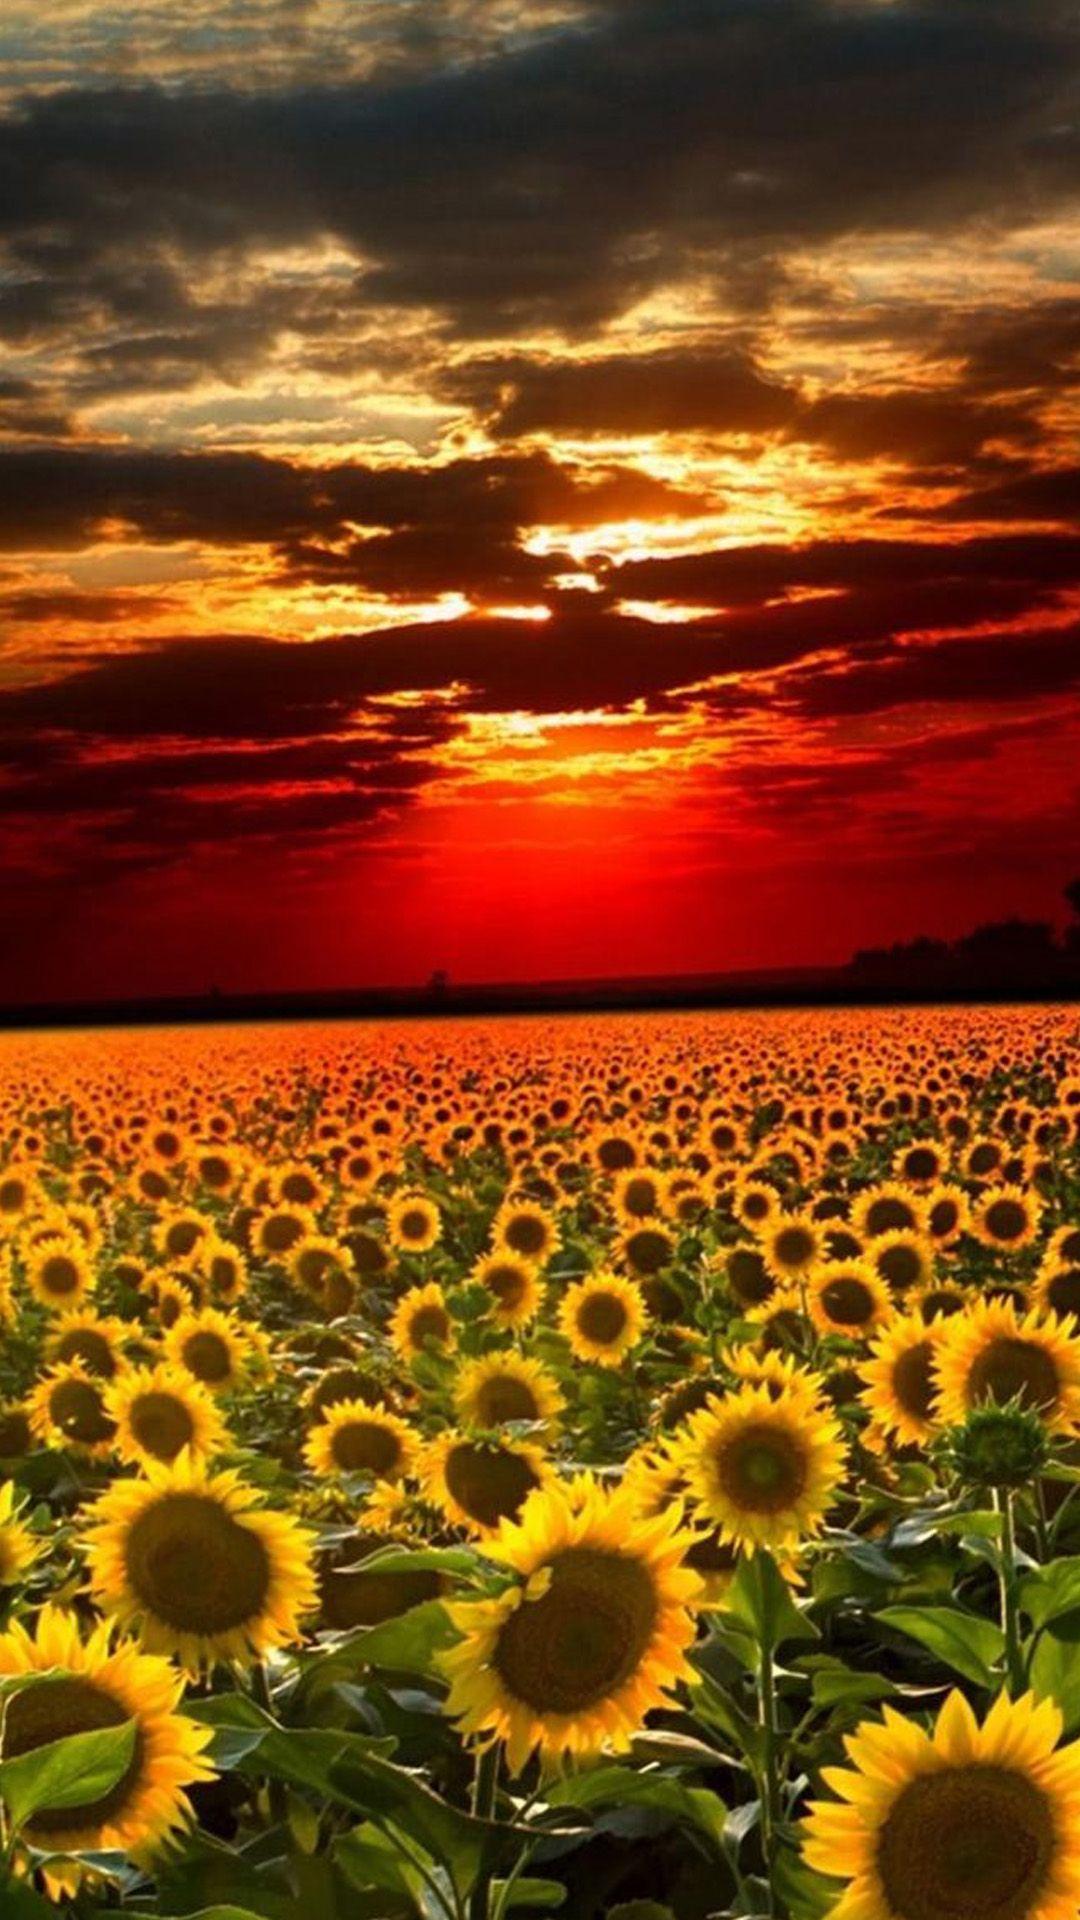 Sunflower iPhone Wallpapers   Top Sunflower iPhone 1080x1920